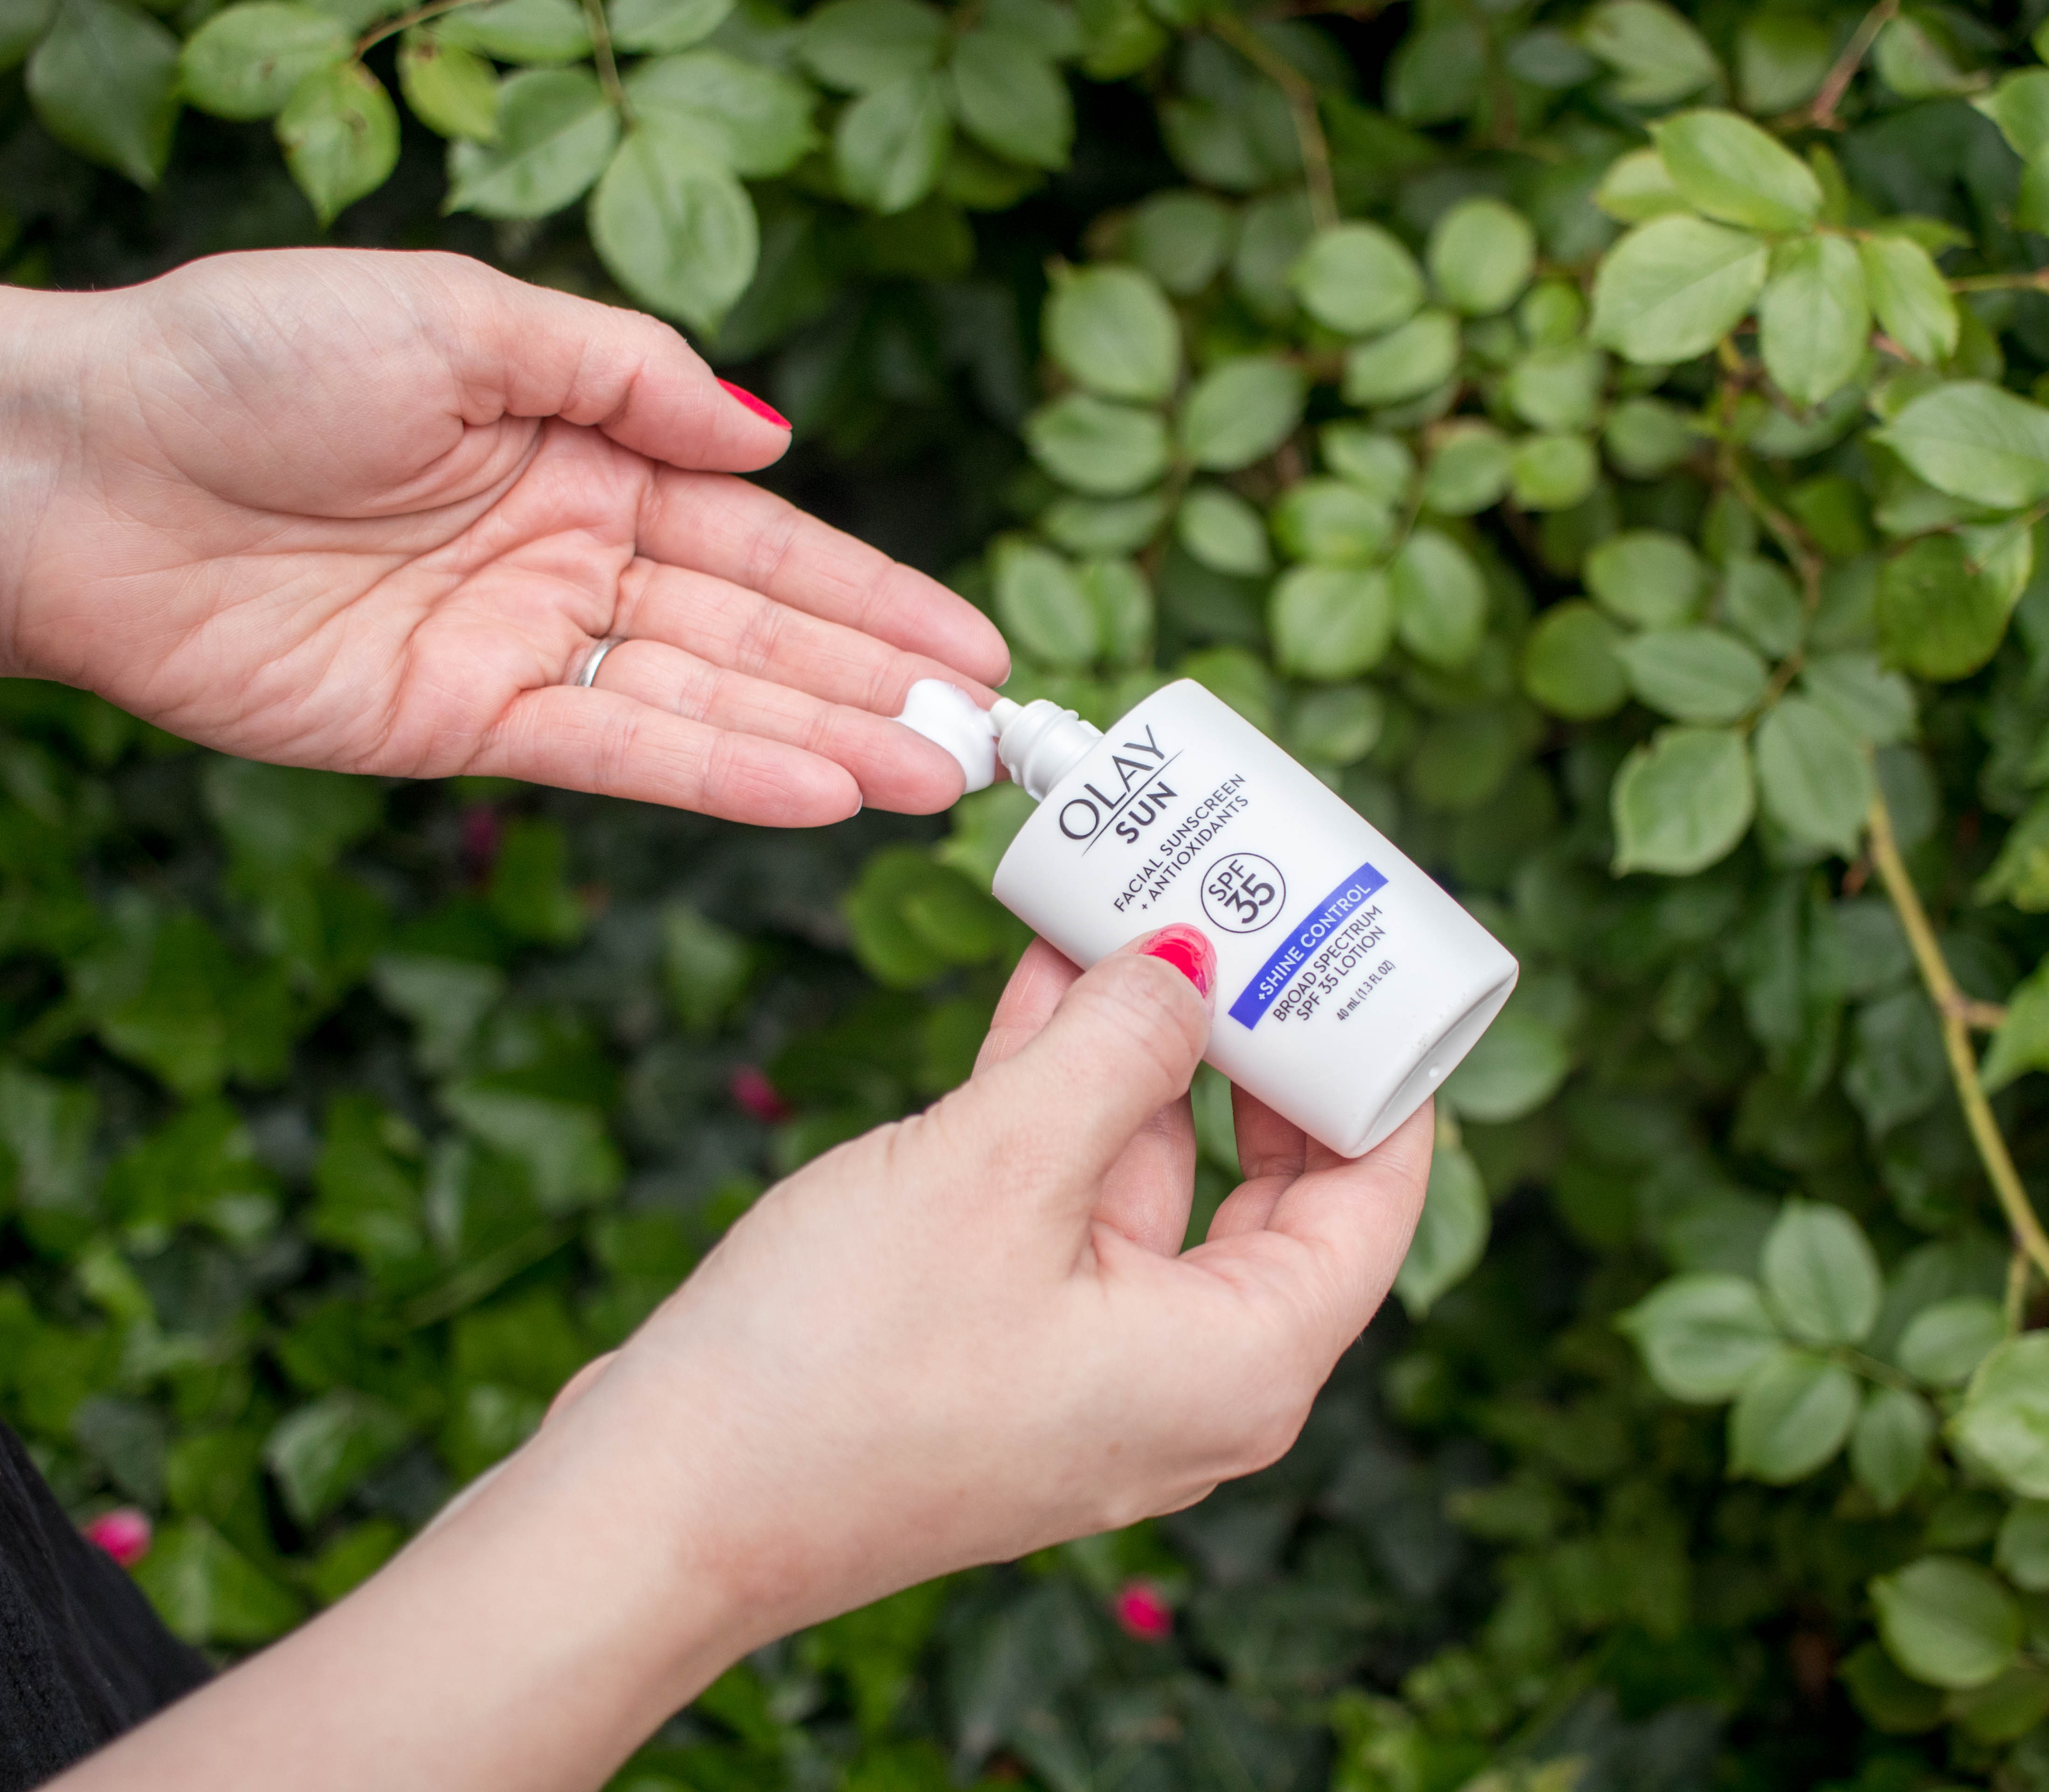 olay sun shine control sunscreen #olaysun #skincare #summerskincare